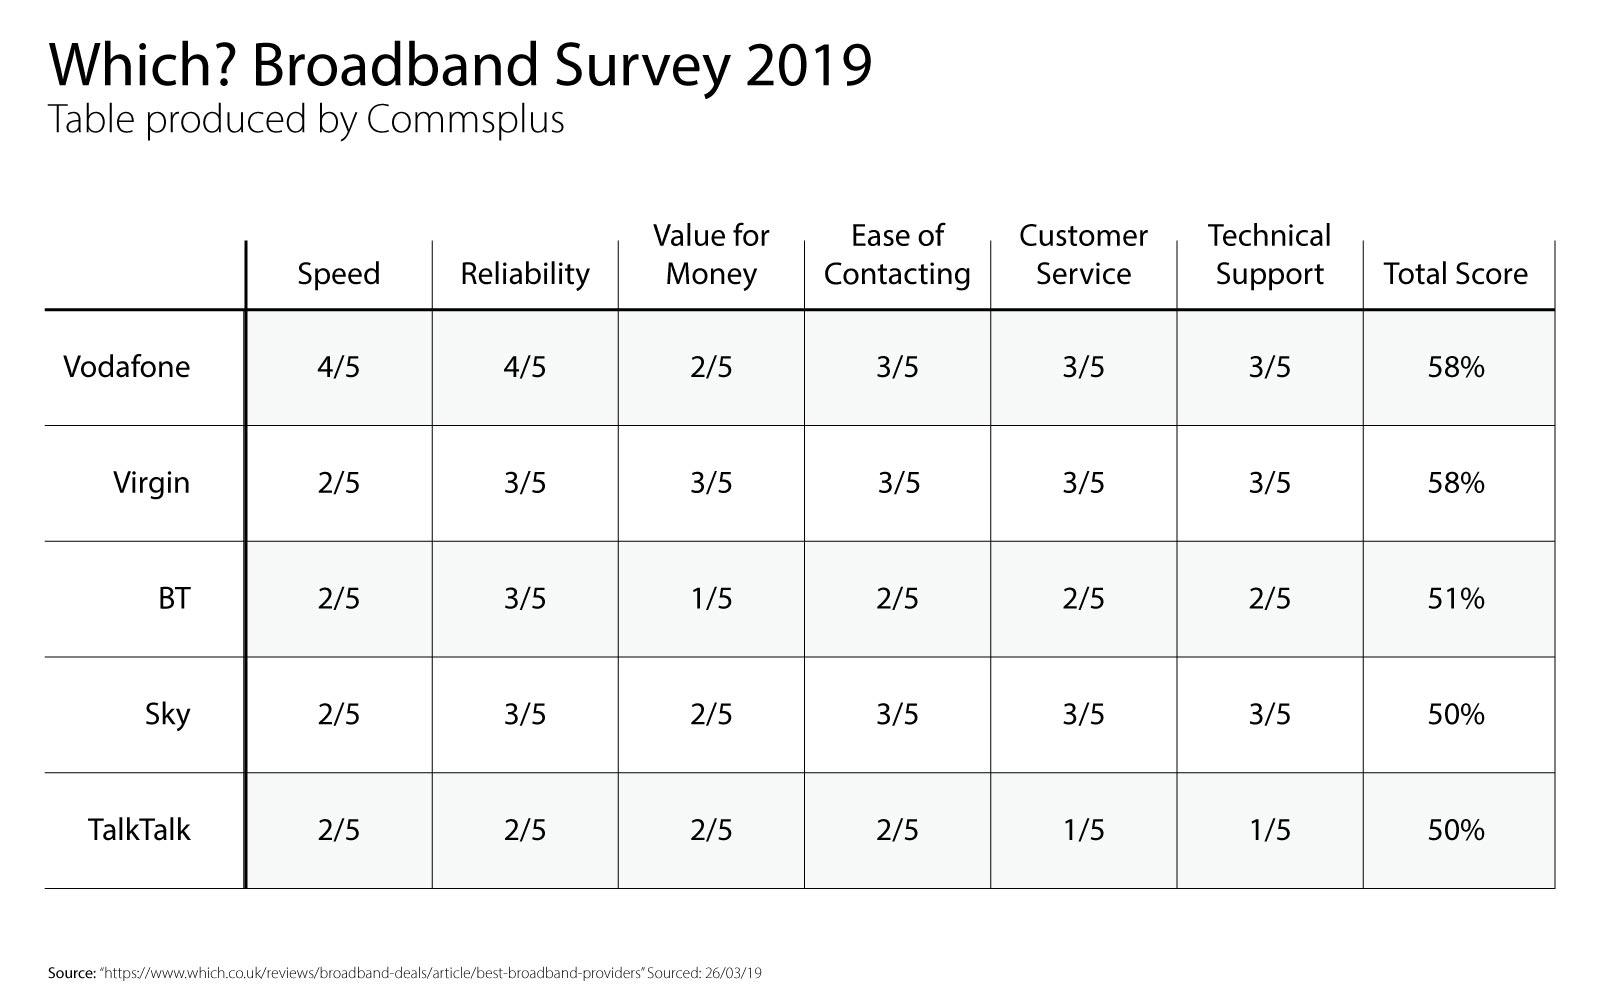 UK broadband survey results 2019